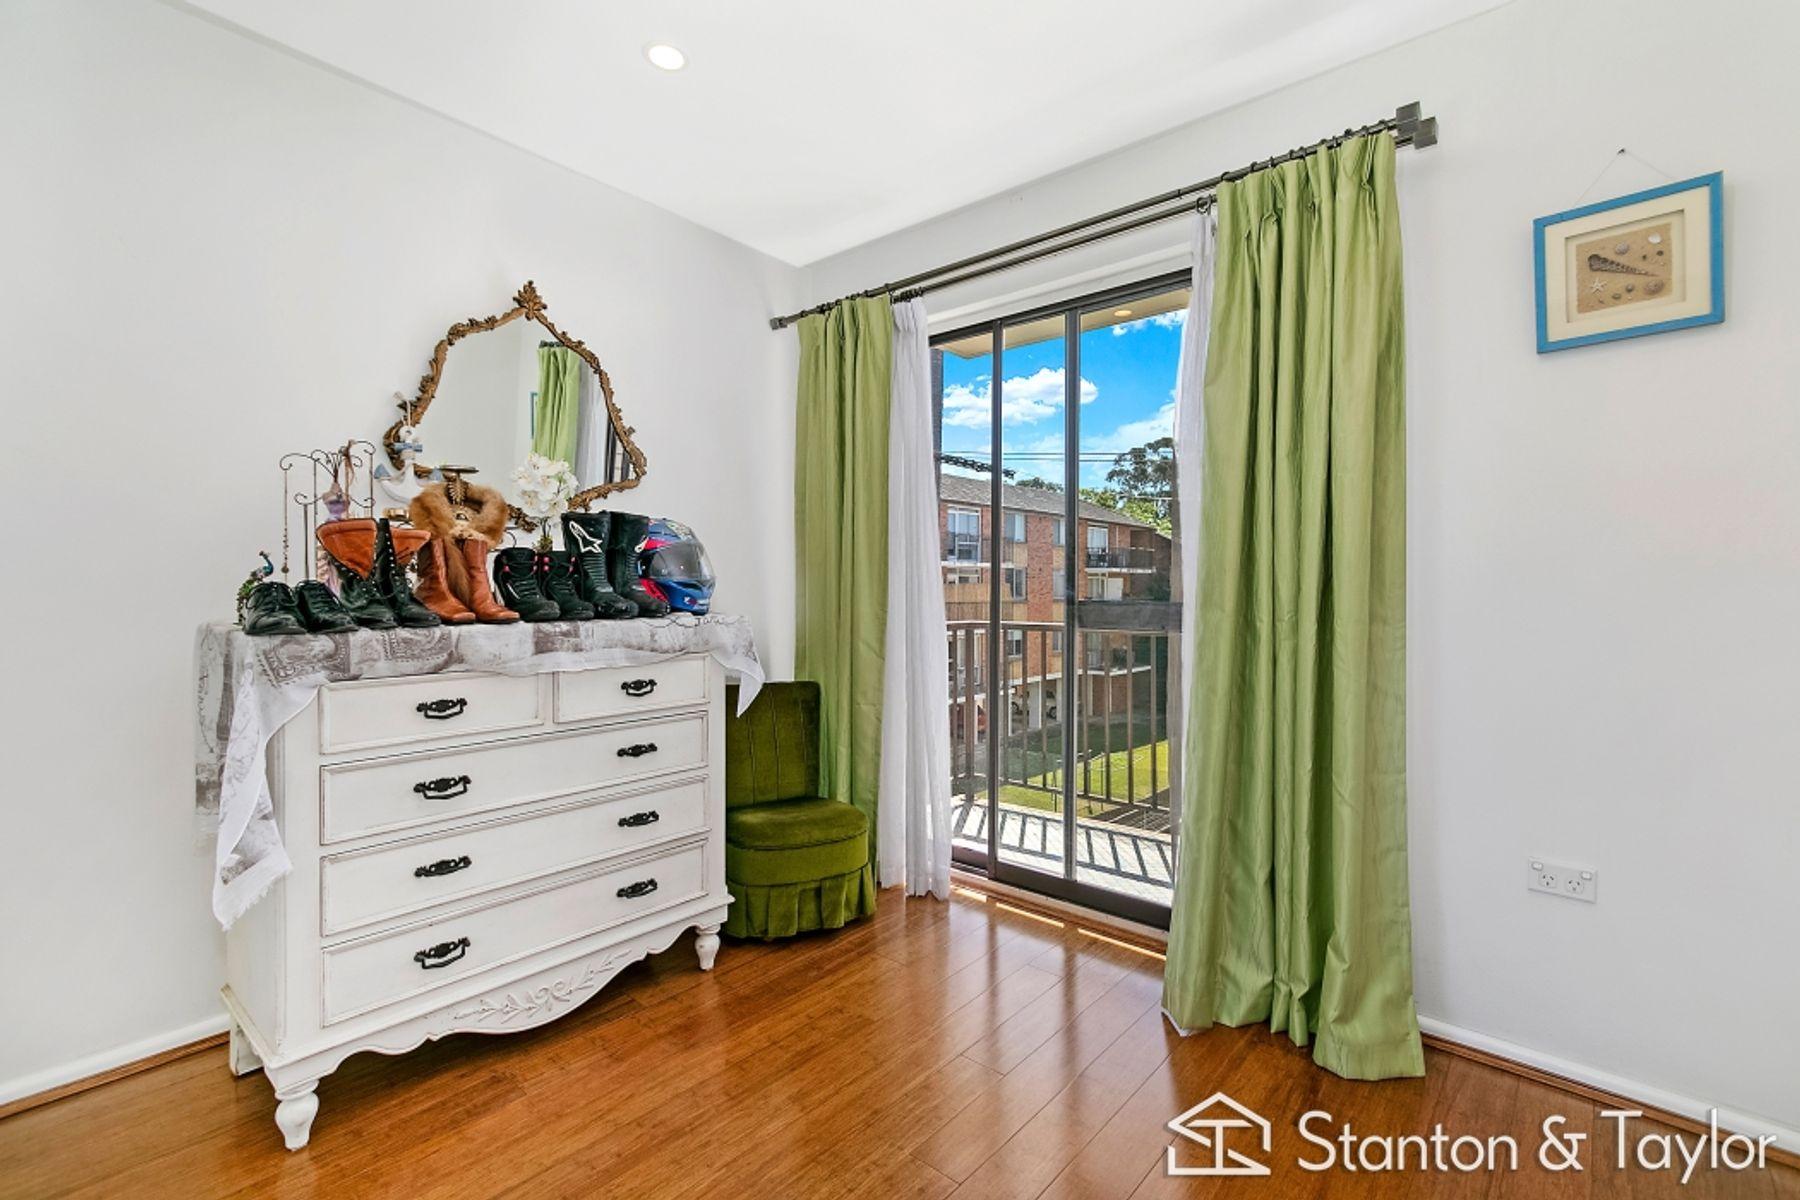 2/191 Derby Street, Penrith, NSW 2750